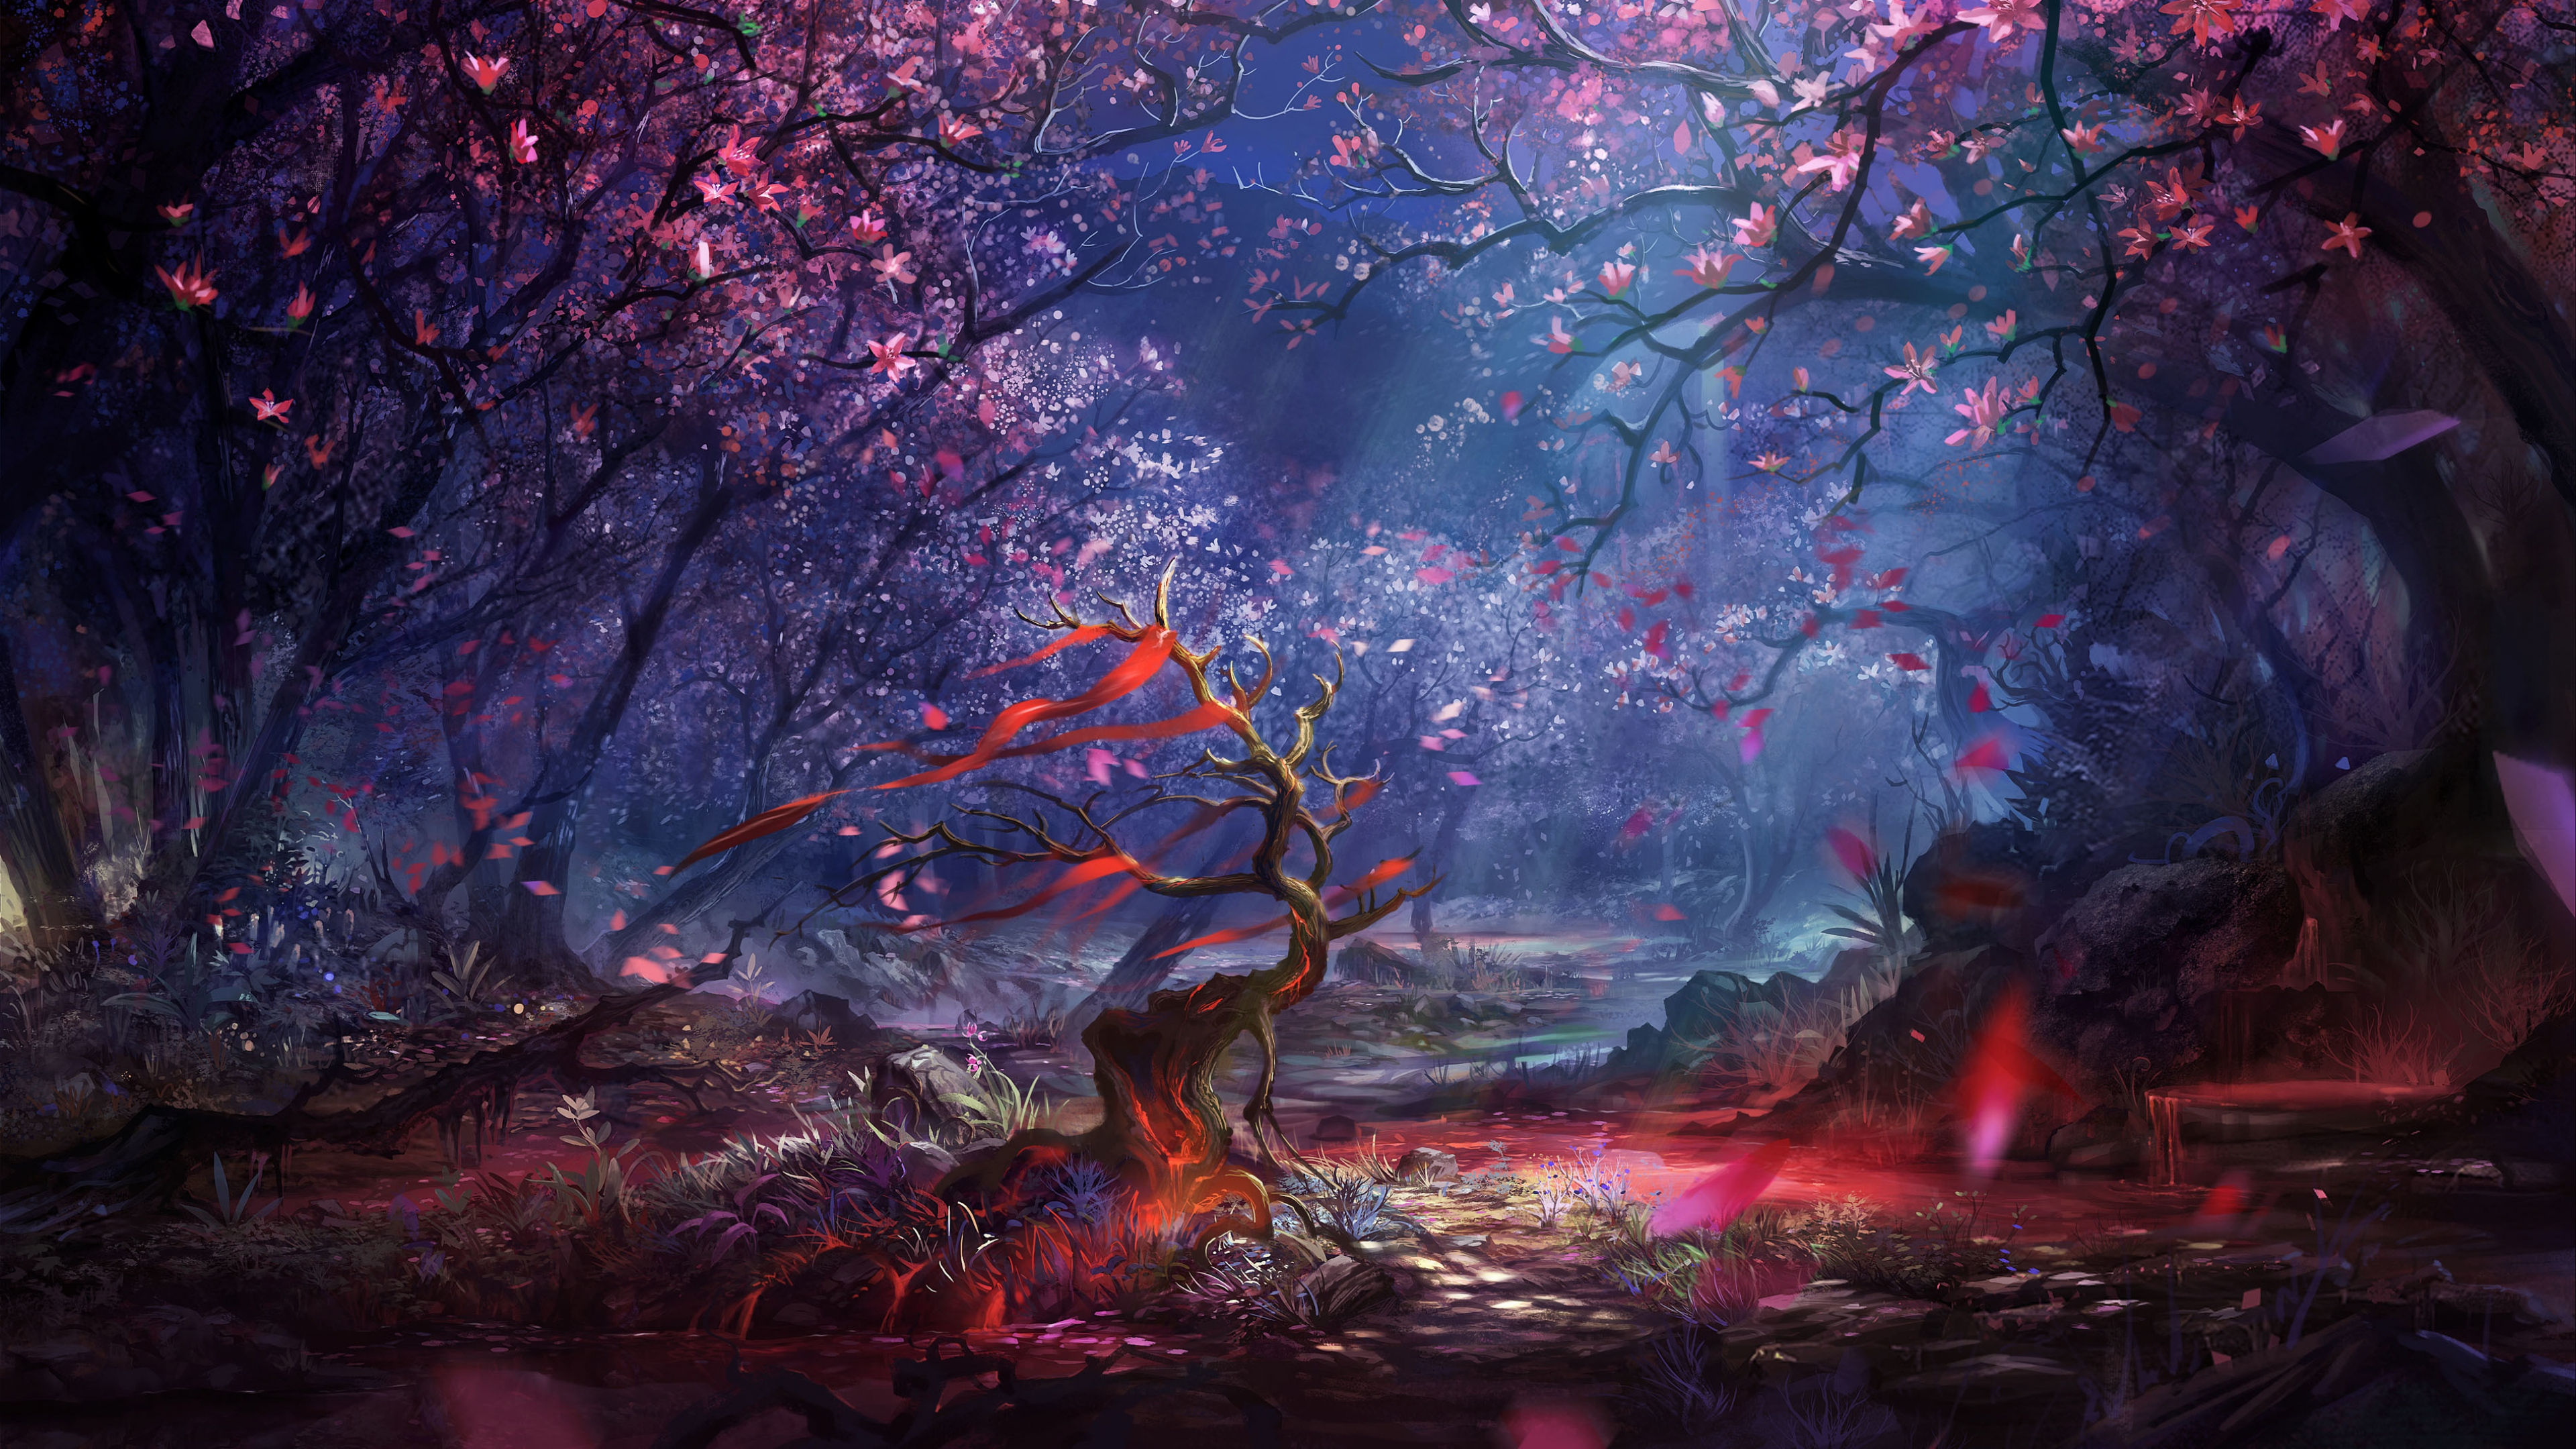 beautiful forest art 4k 1540748318 - Beautiful Forest Art 4k - forest wallpapers, digital art wallpapers, artist wallpapers, art wallpapers